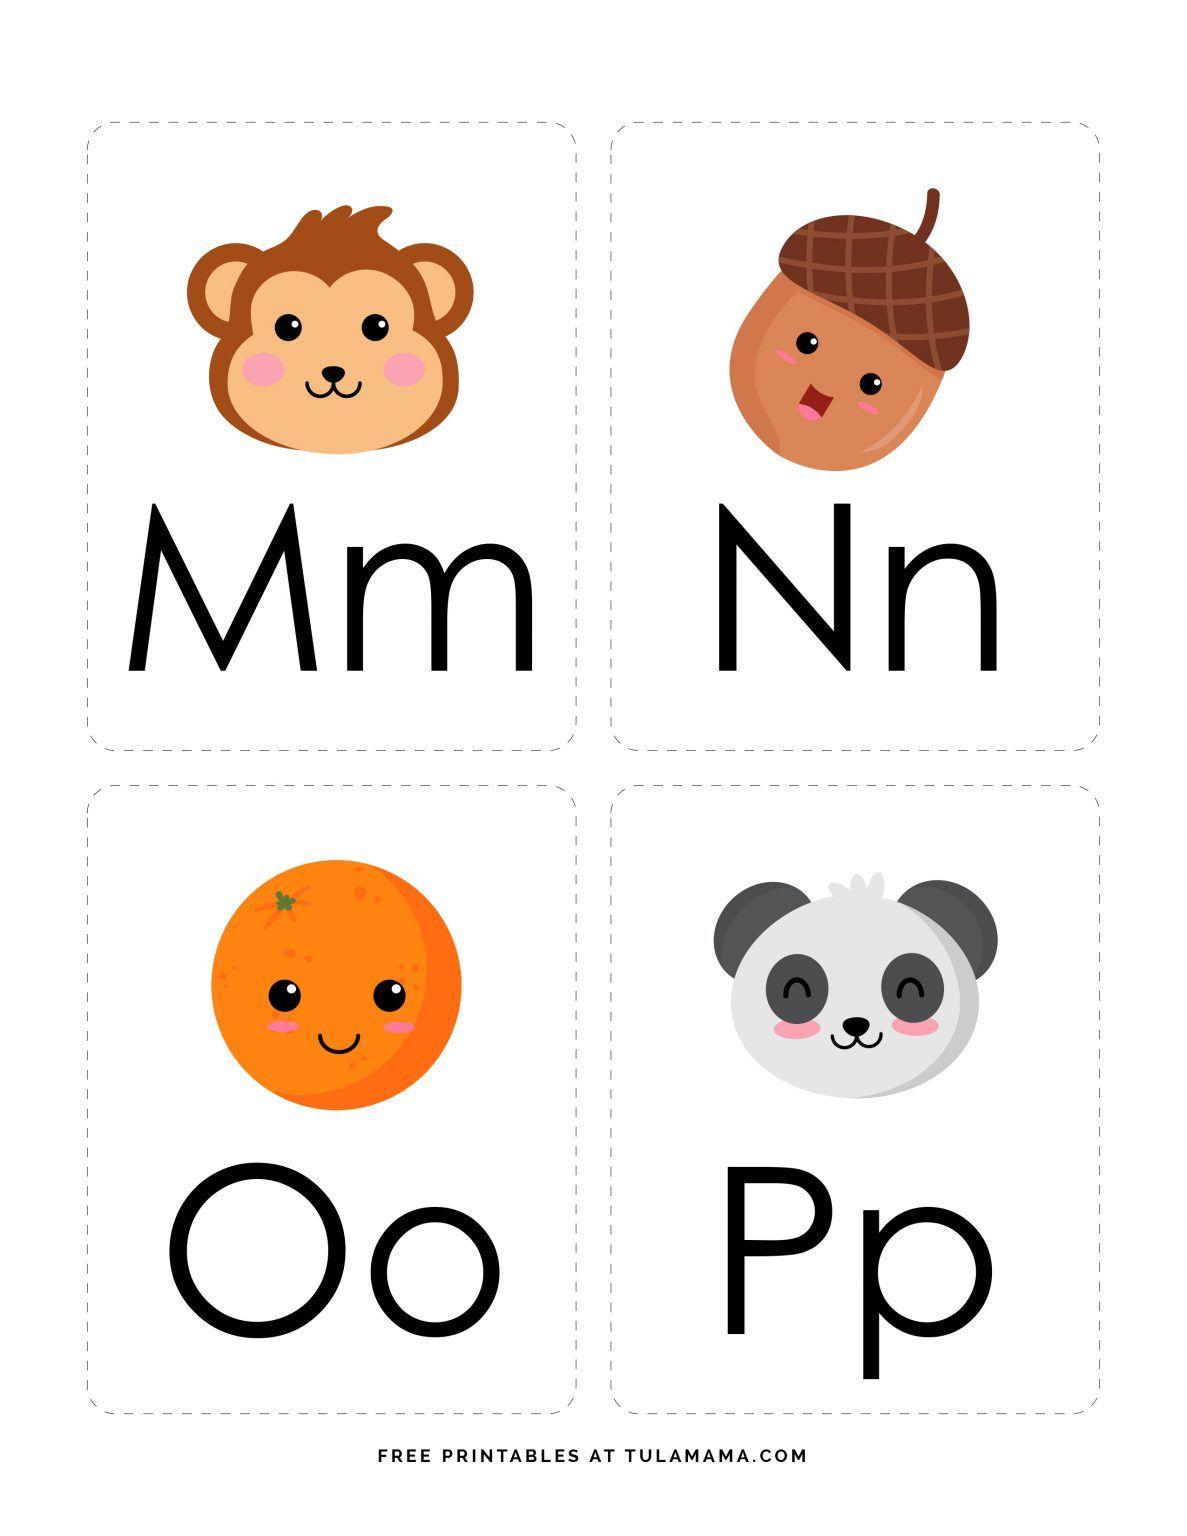 Fun free engaging alphabet flash cards for preschoolers